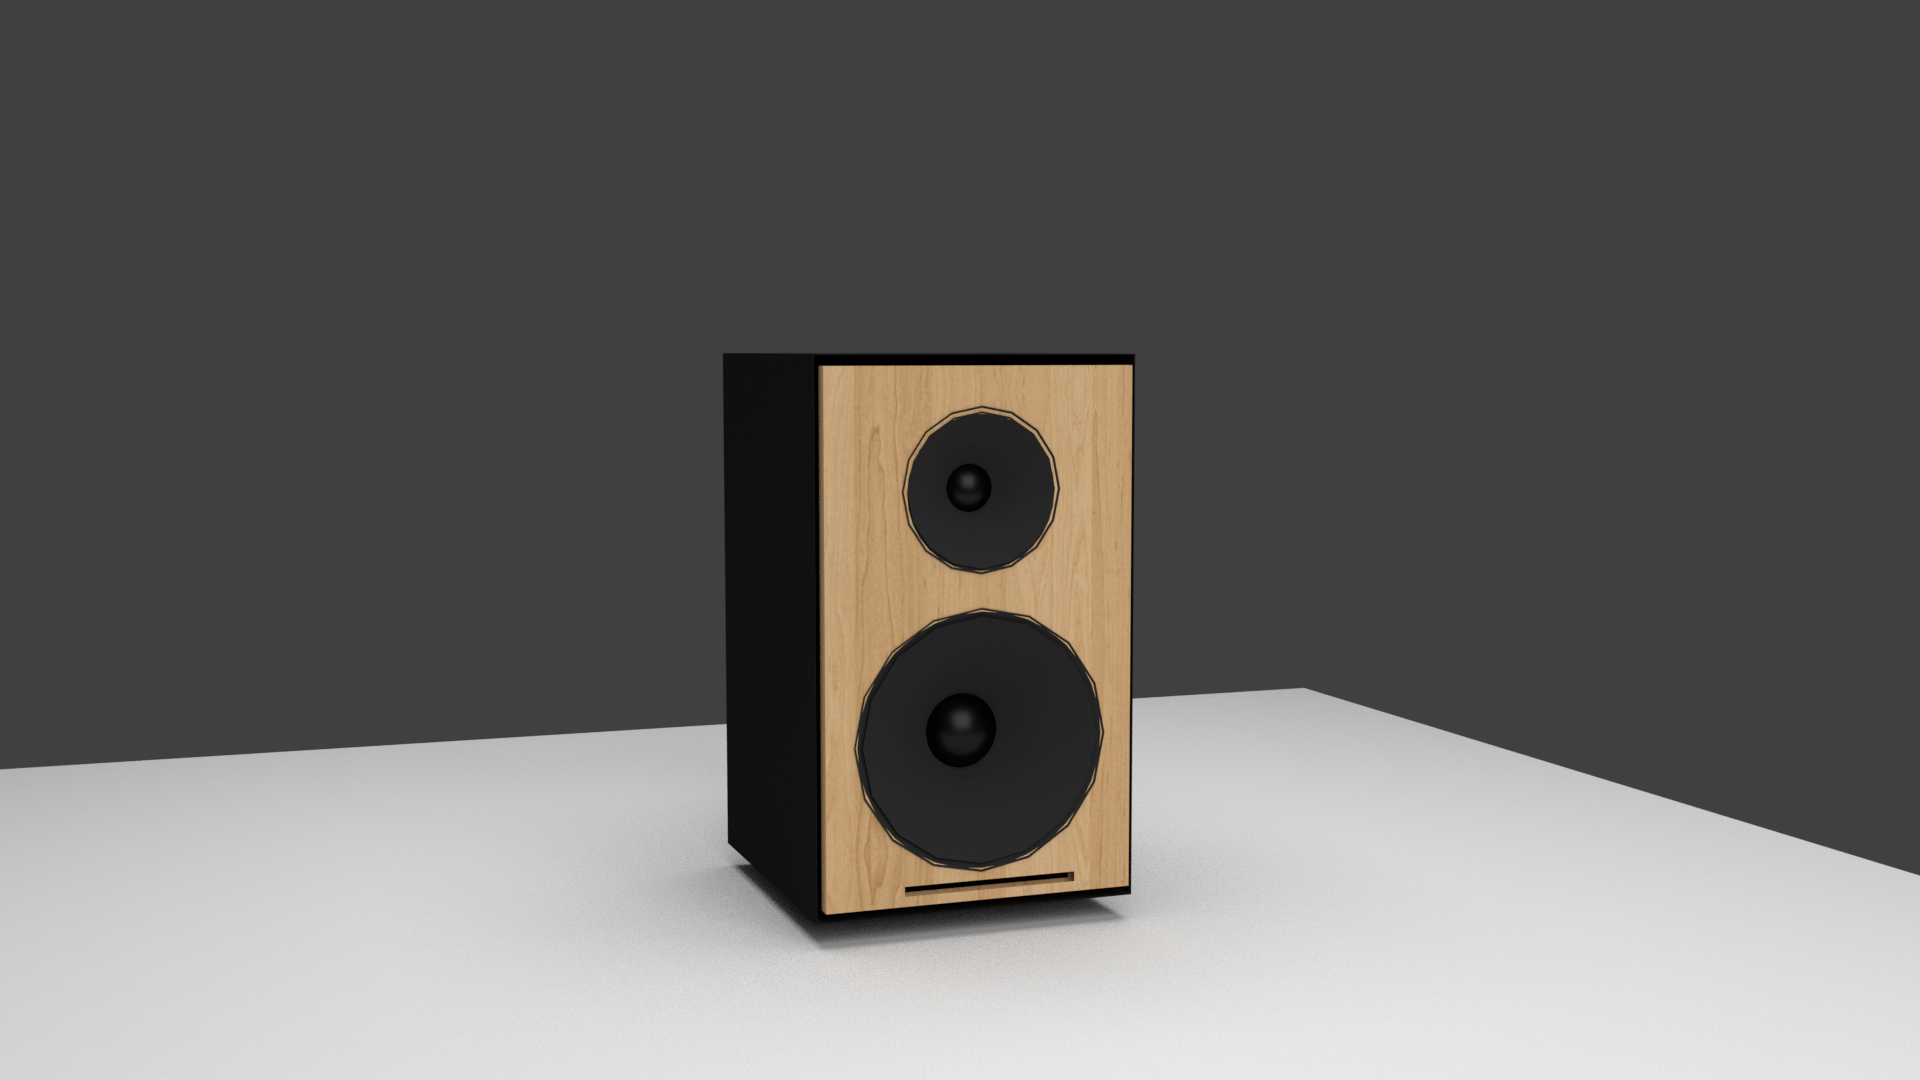 speaker.png Download free STL file Speaker • 3D print object, ViyanPishro